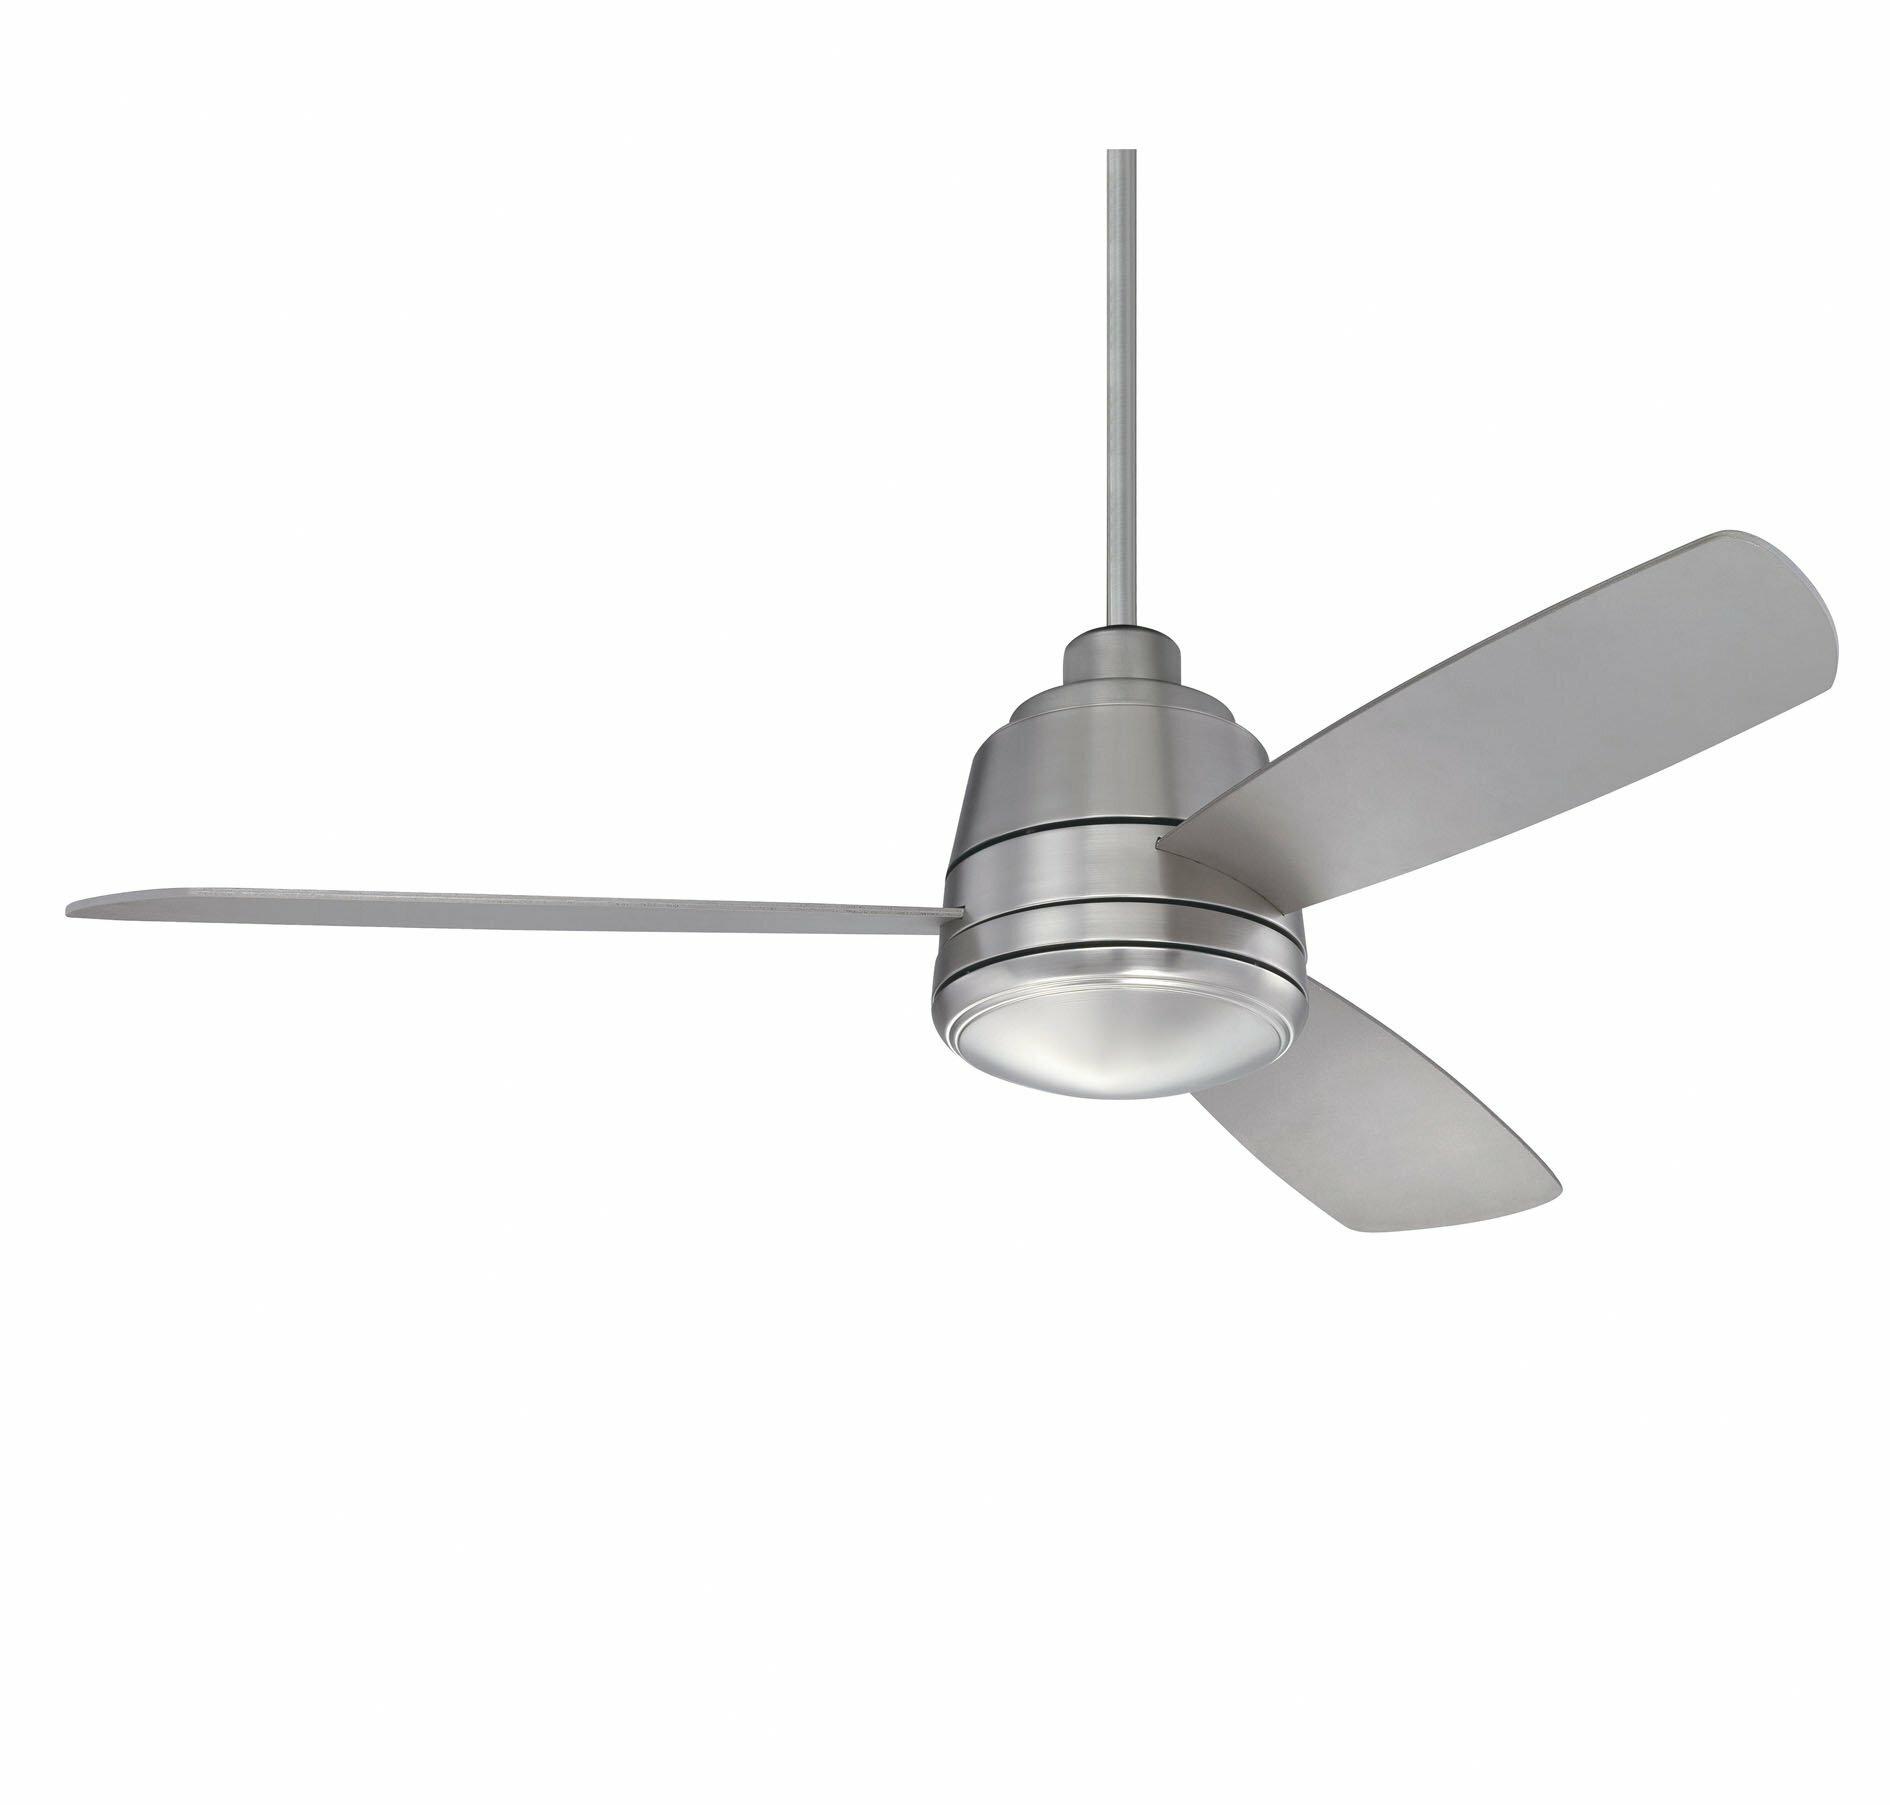 ceiling bajaj hs original list three price fans blade fan in india centrim crystal pearl ceilings